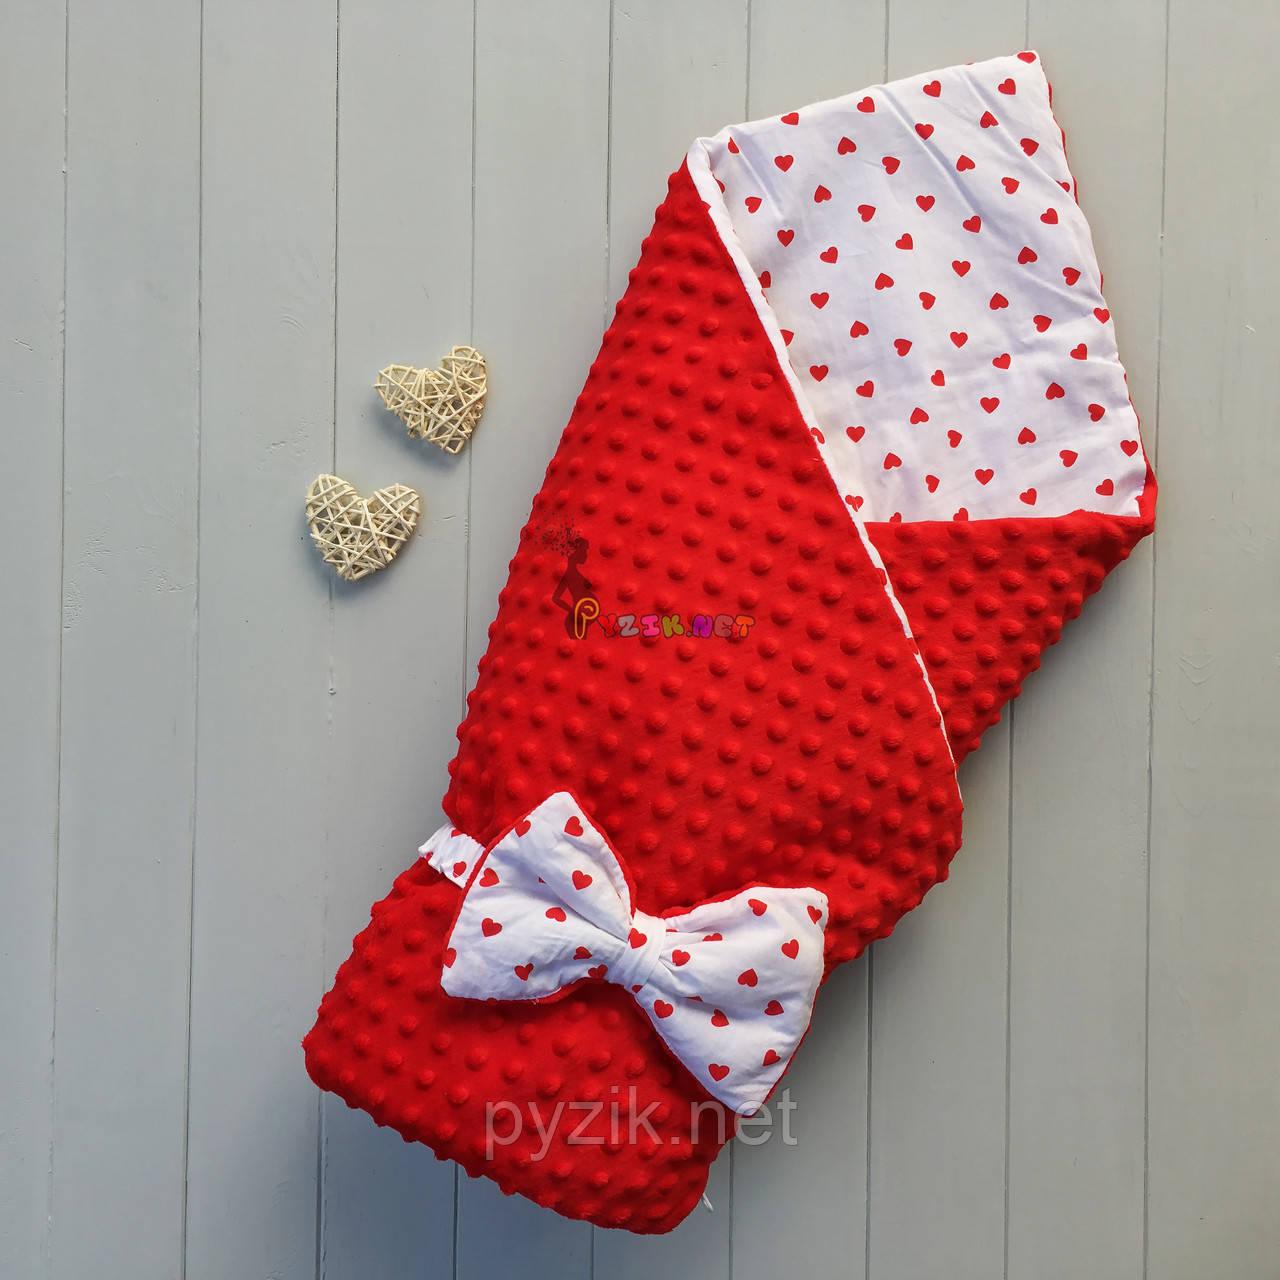 Конверт-одеяло минки на съемном синтепоне красный